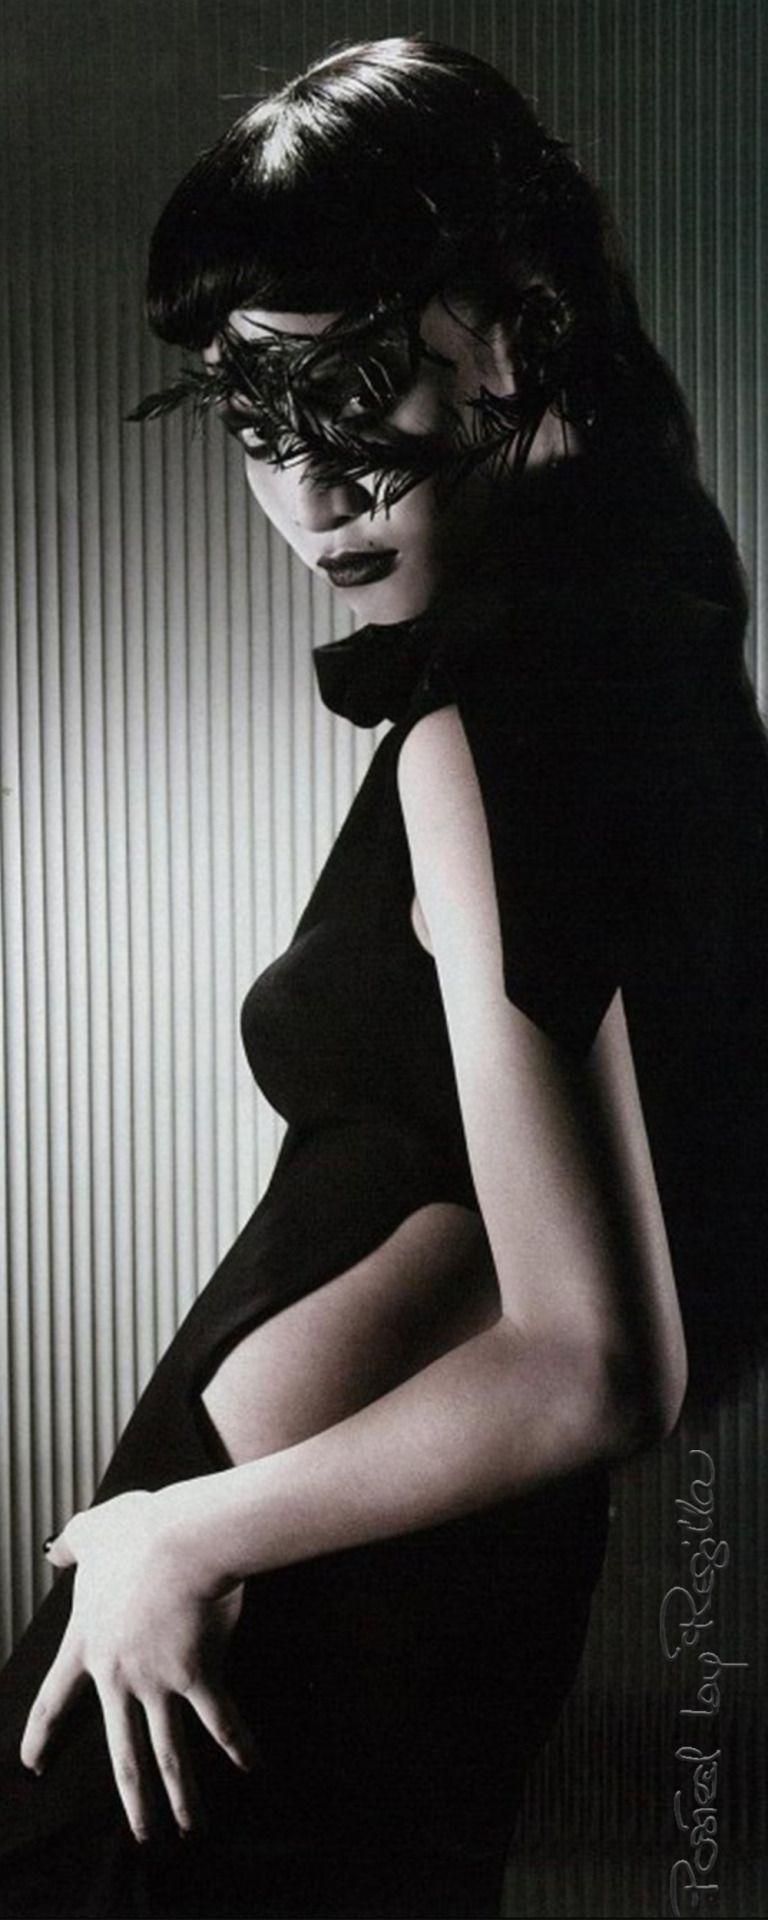 Regilla ⚜ Picture of Lanna Hiranyalekha